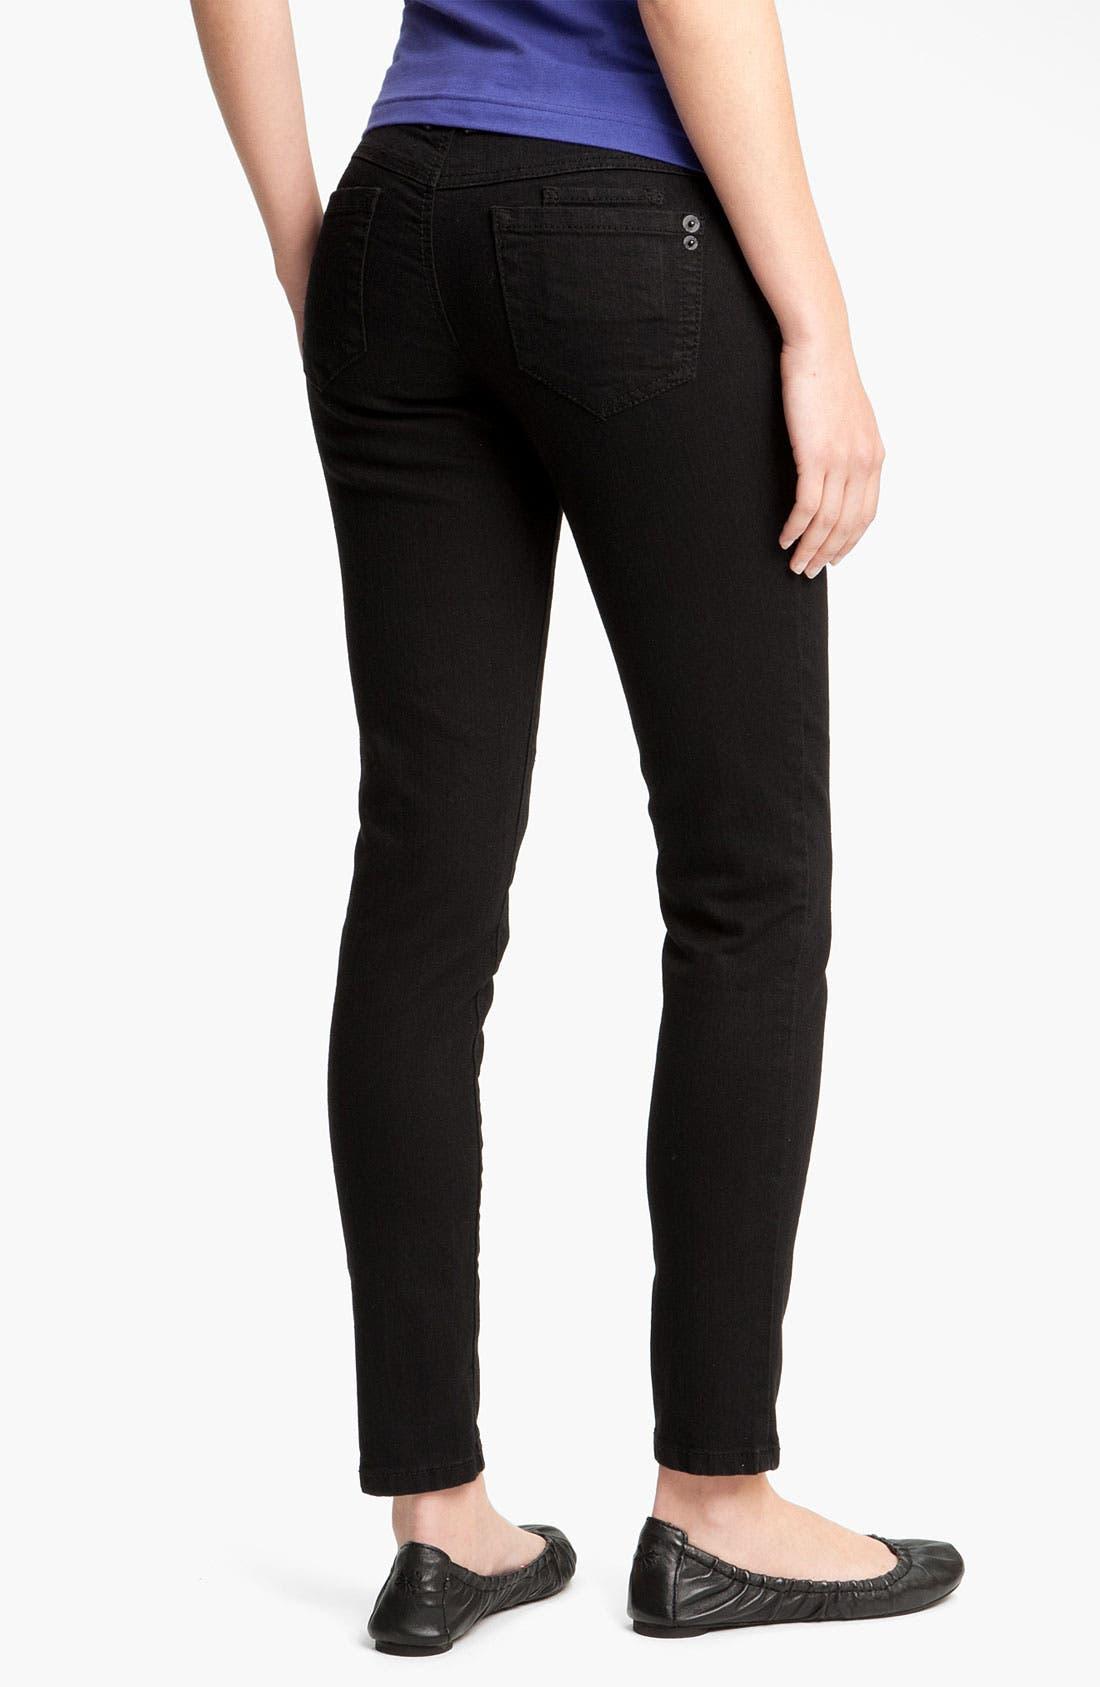 Alternate Image 1 Selected - Jolt Stretch Skinny Jeans (Juniors)